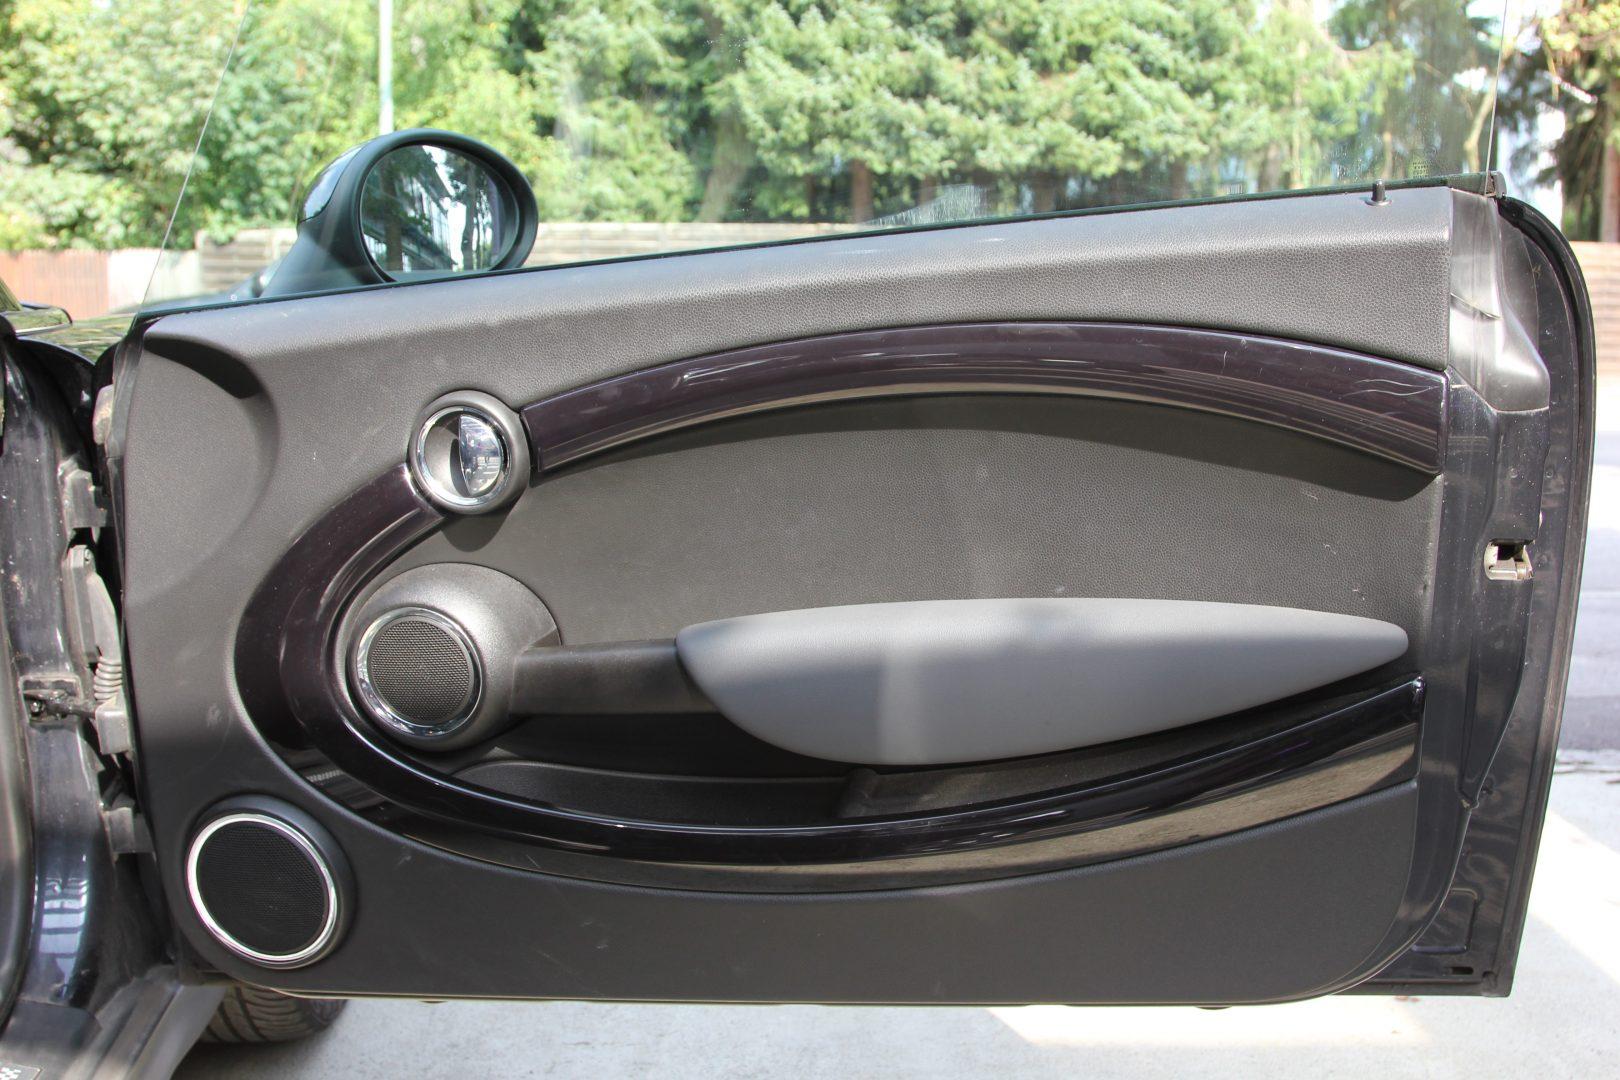 AIL MINI MINI Cooper S 11